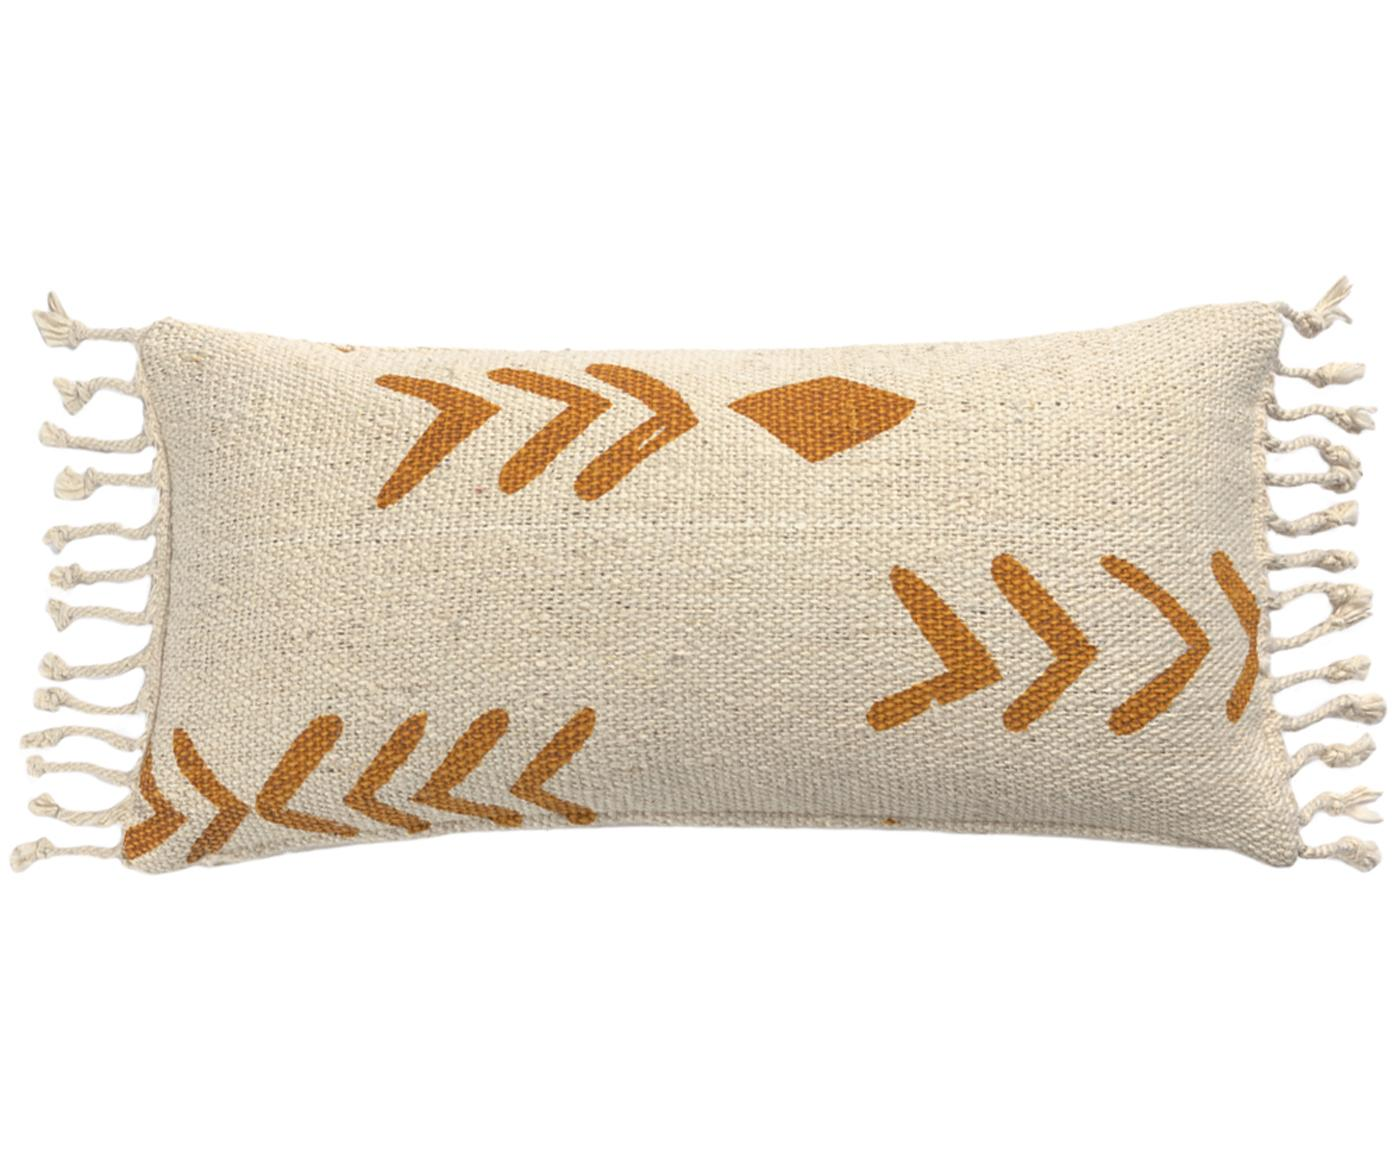 Kissenhülle Moises, 100% Baumwolle, Gebrochenes Weiss, Senfgelb, 30 x 60 cm